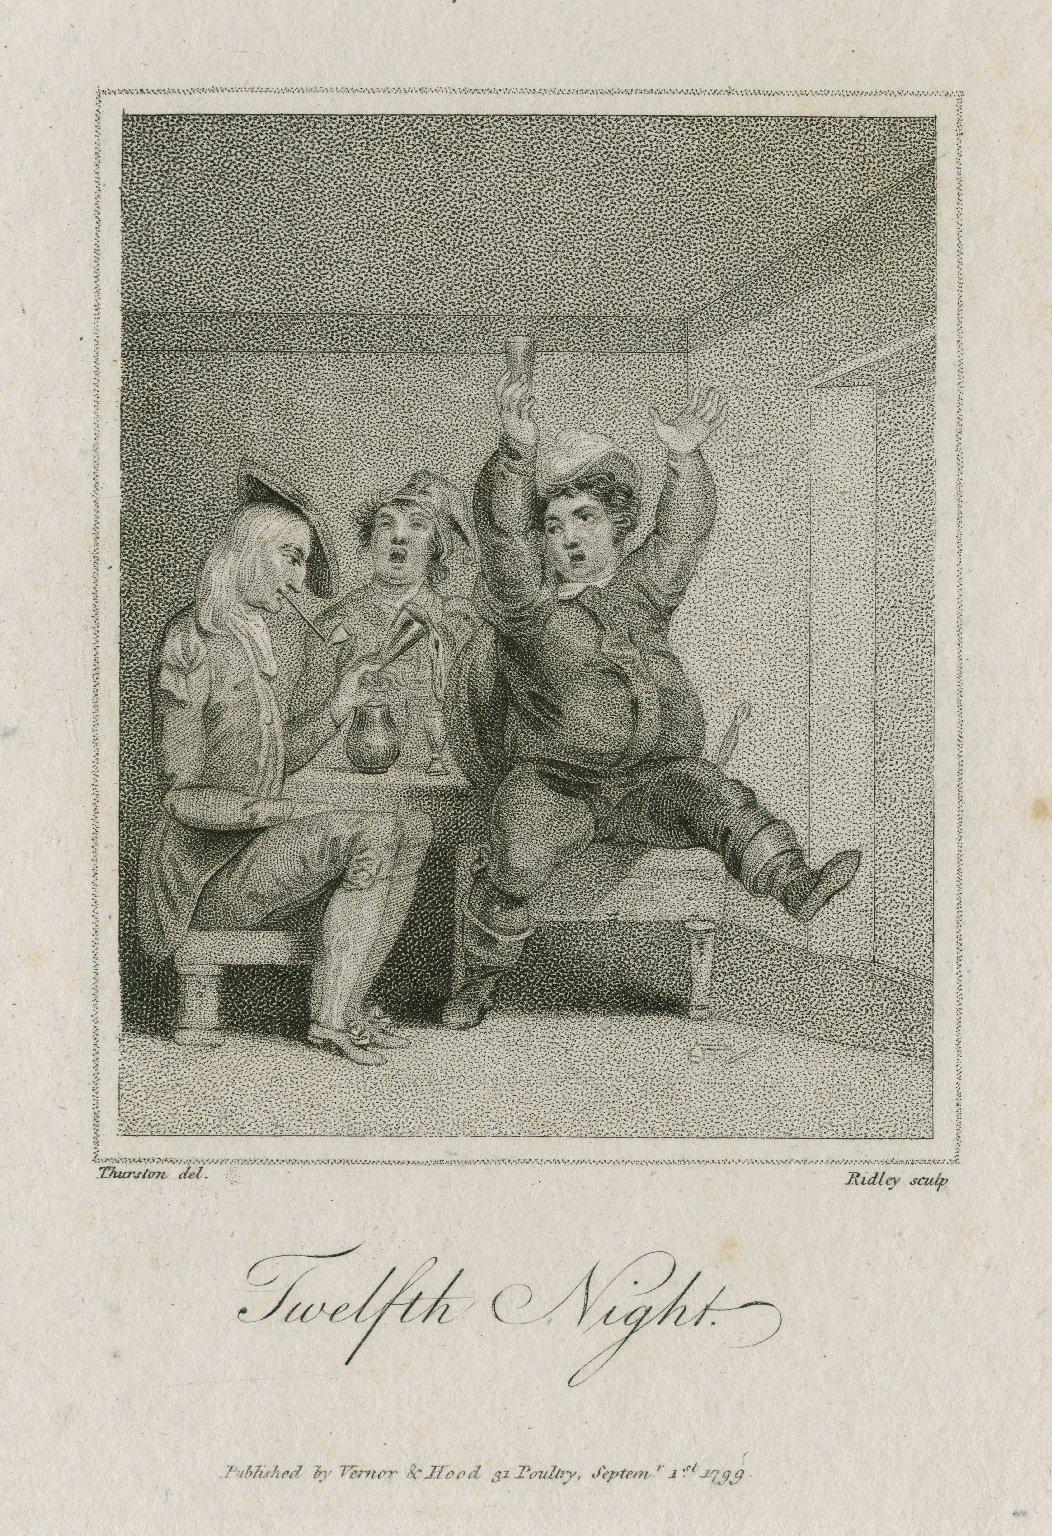 Twelfth night, [act II, sc. 3] [graphic] / Thurston, del. ; Ridley, sculp.